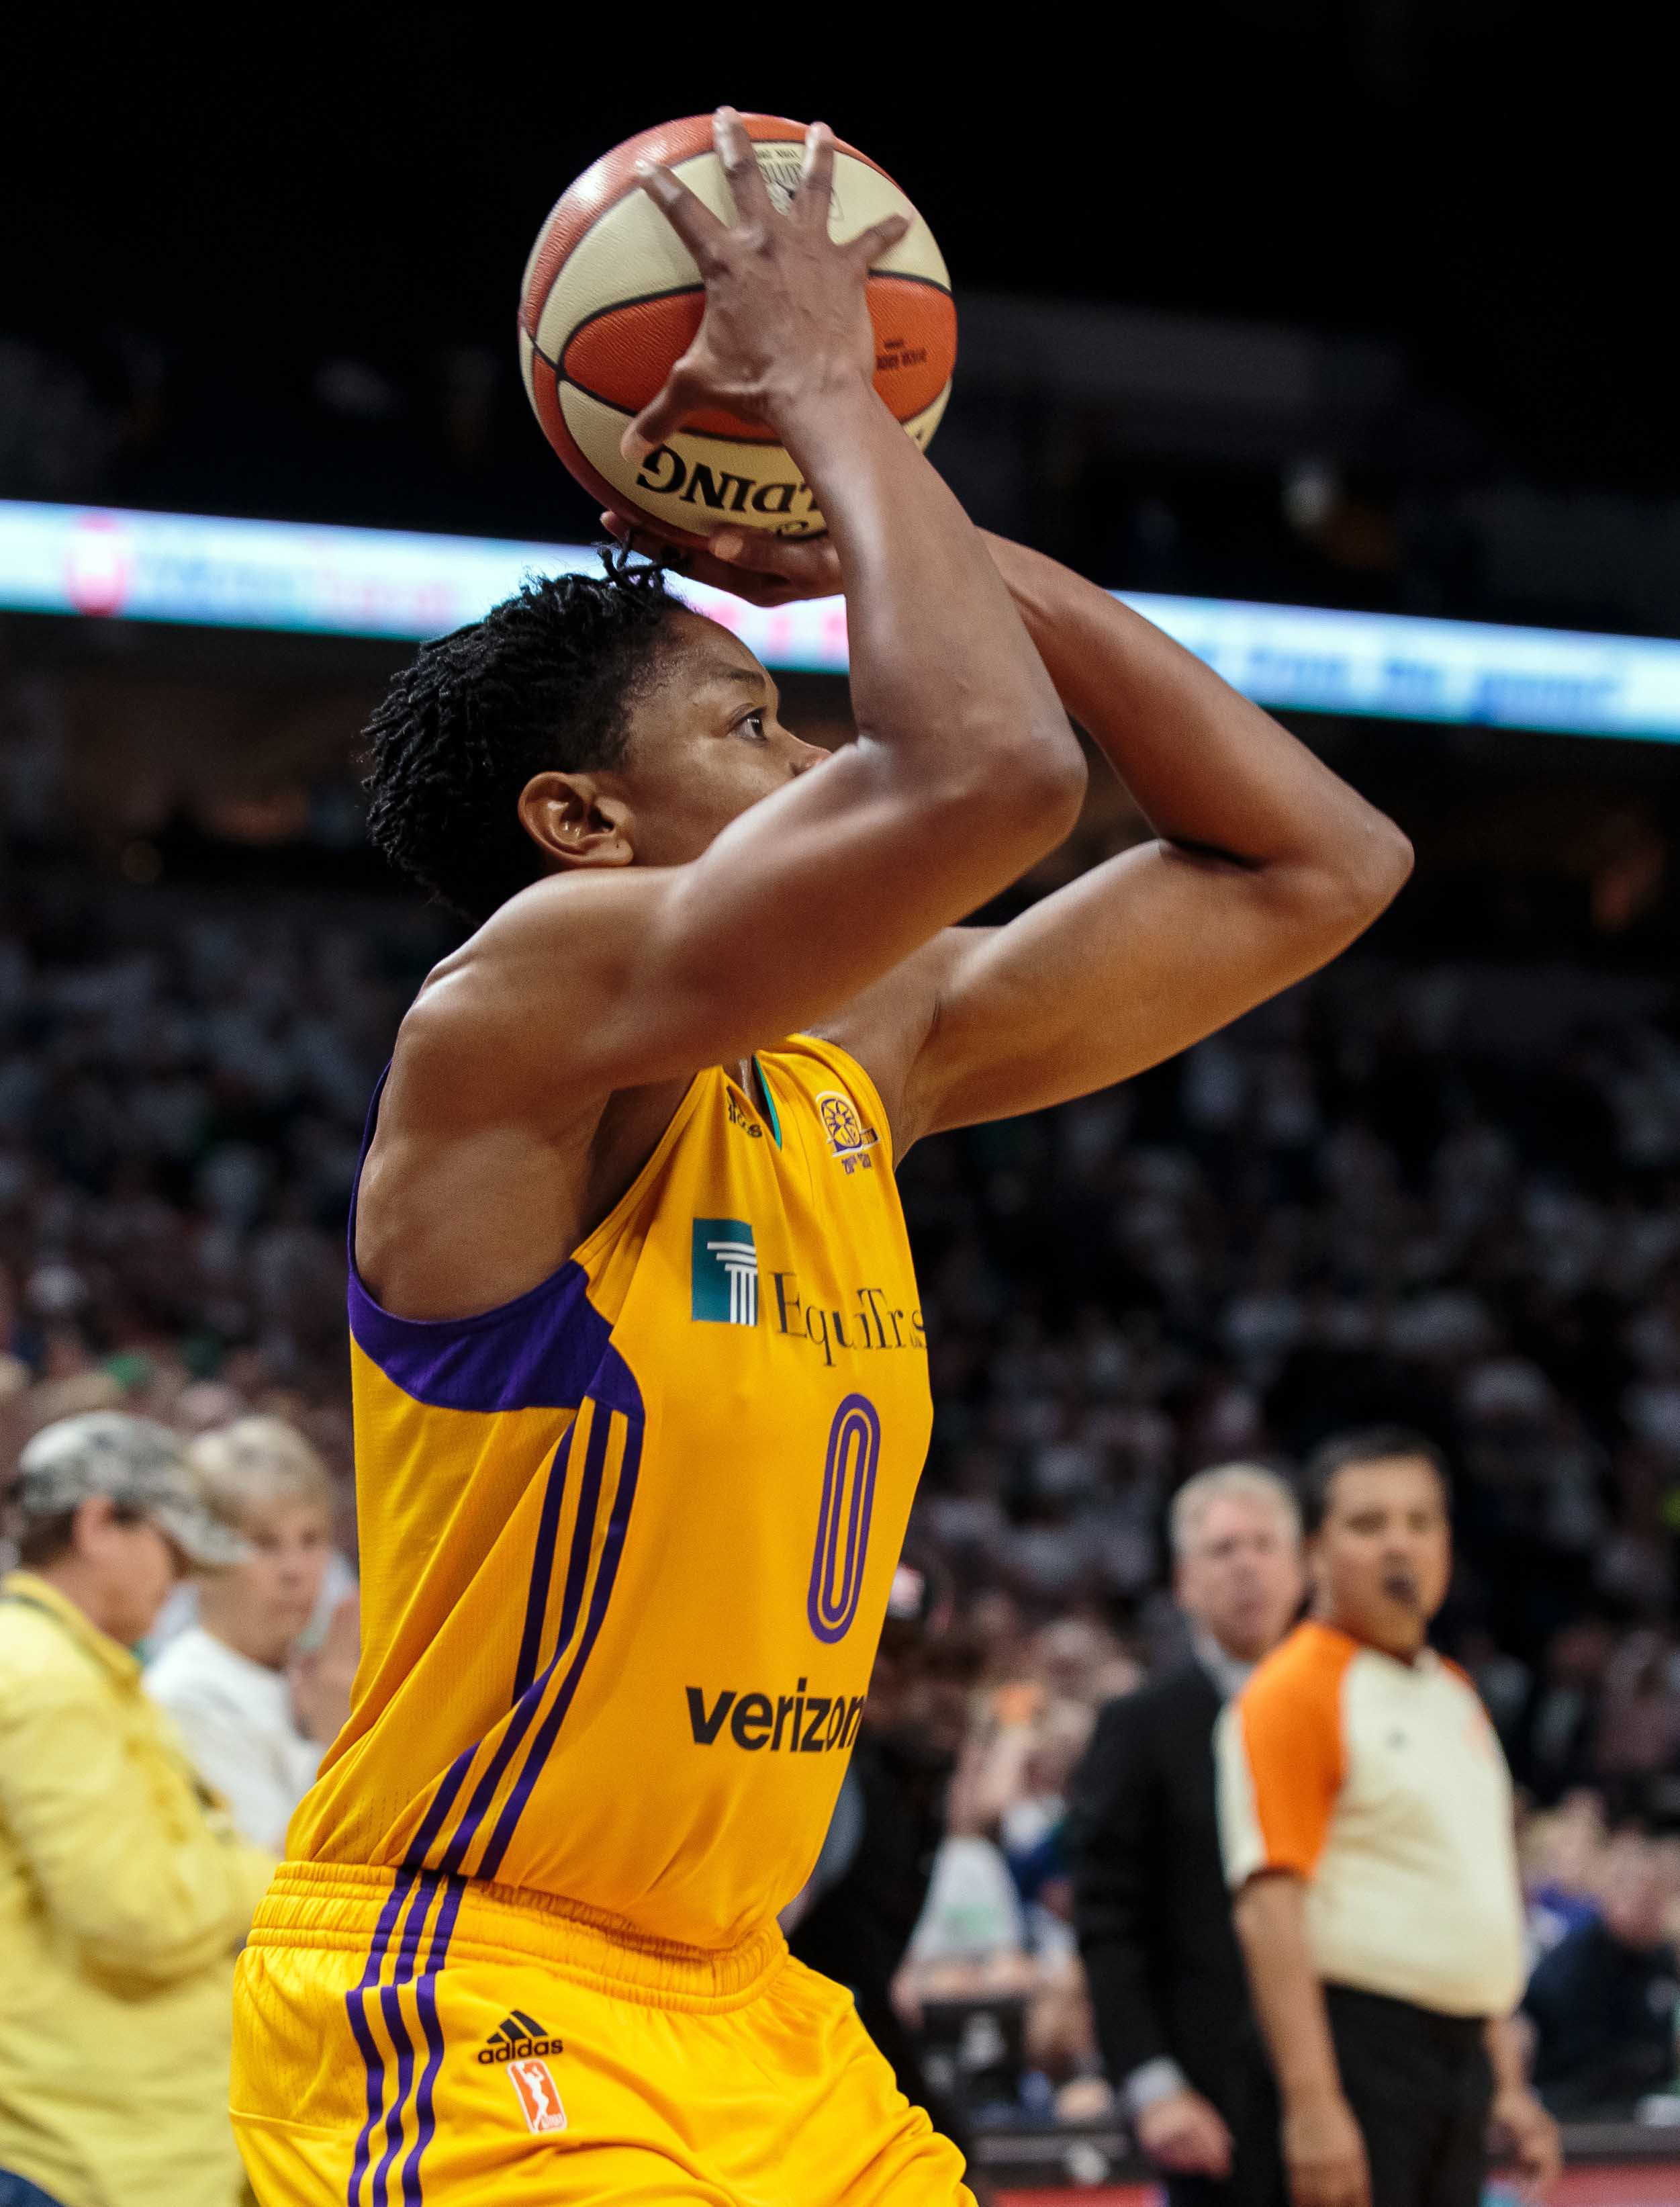 WNBA: Los Angeles Sparks at Minnesota Lynx. Alana Beard's game-winner